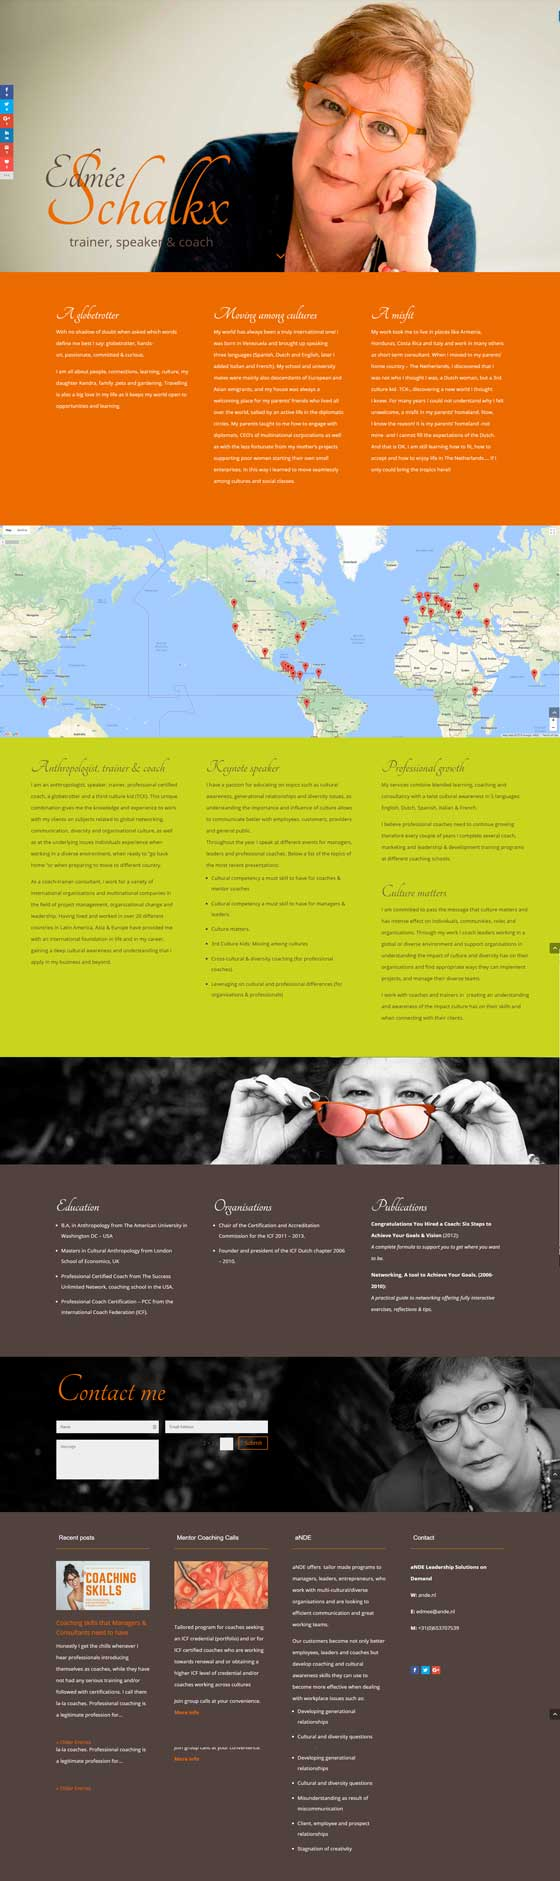 sitio web Ande coaching